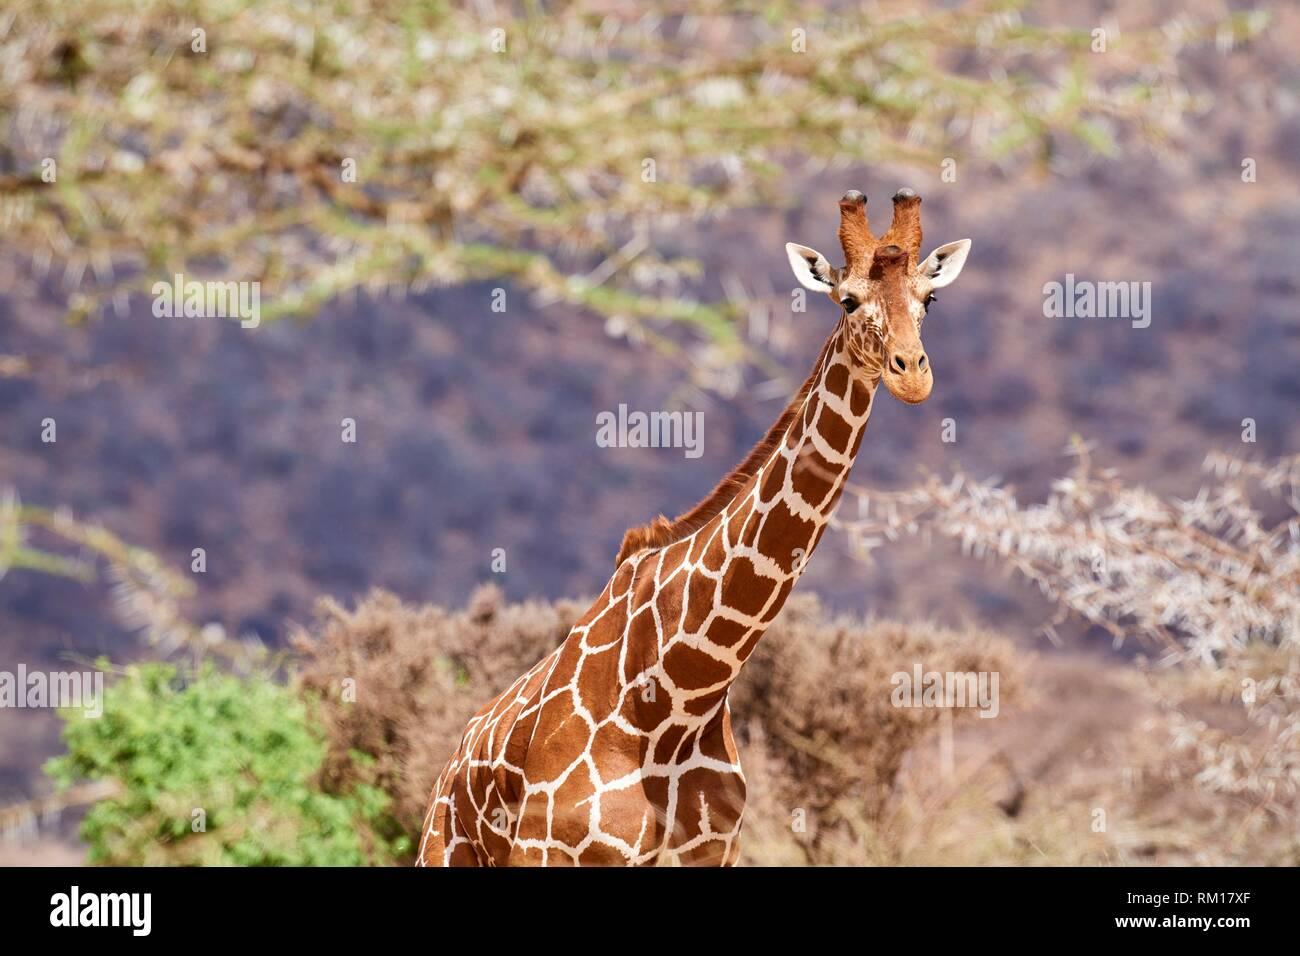 Reticulated giraffe {Giraffa camelopardalis reticulata} head and neck, Samburu National Reserve, Kenya, Africa. Stock Photo